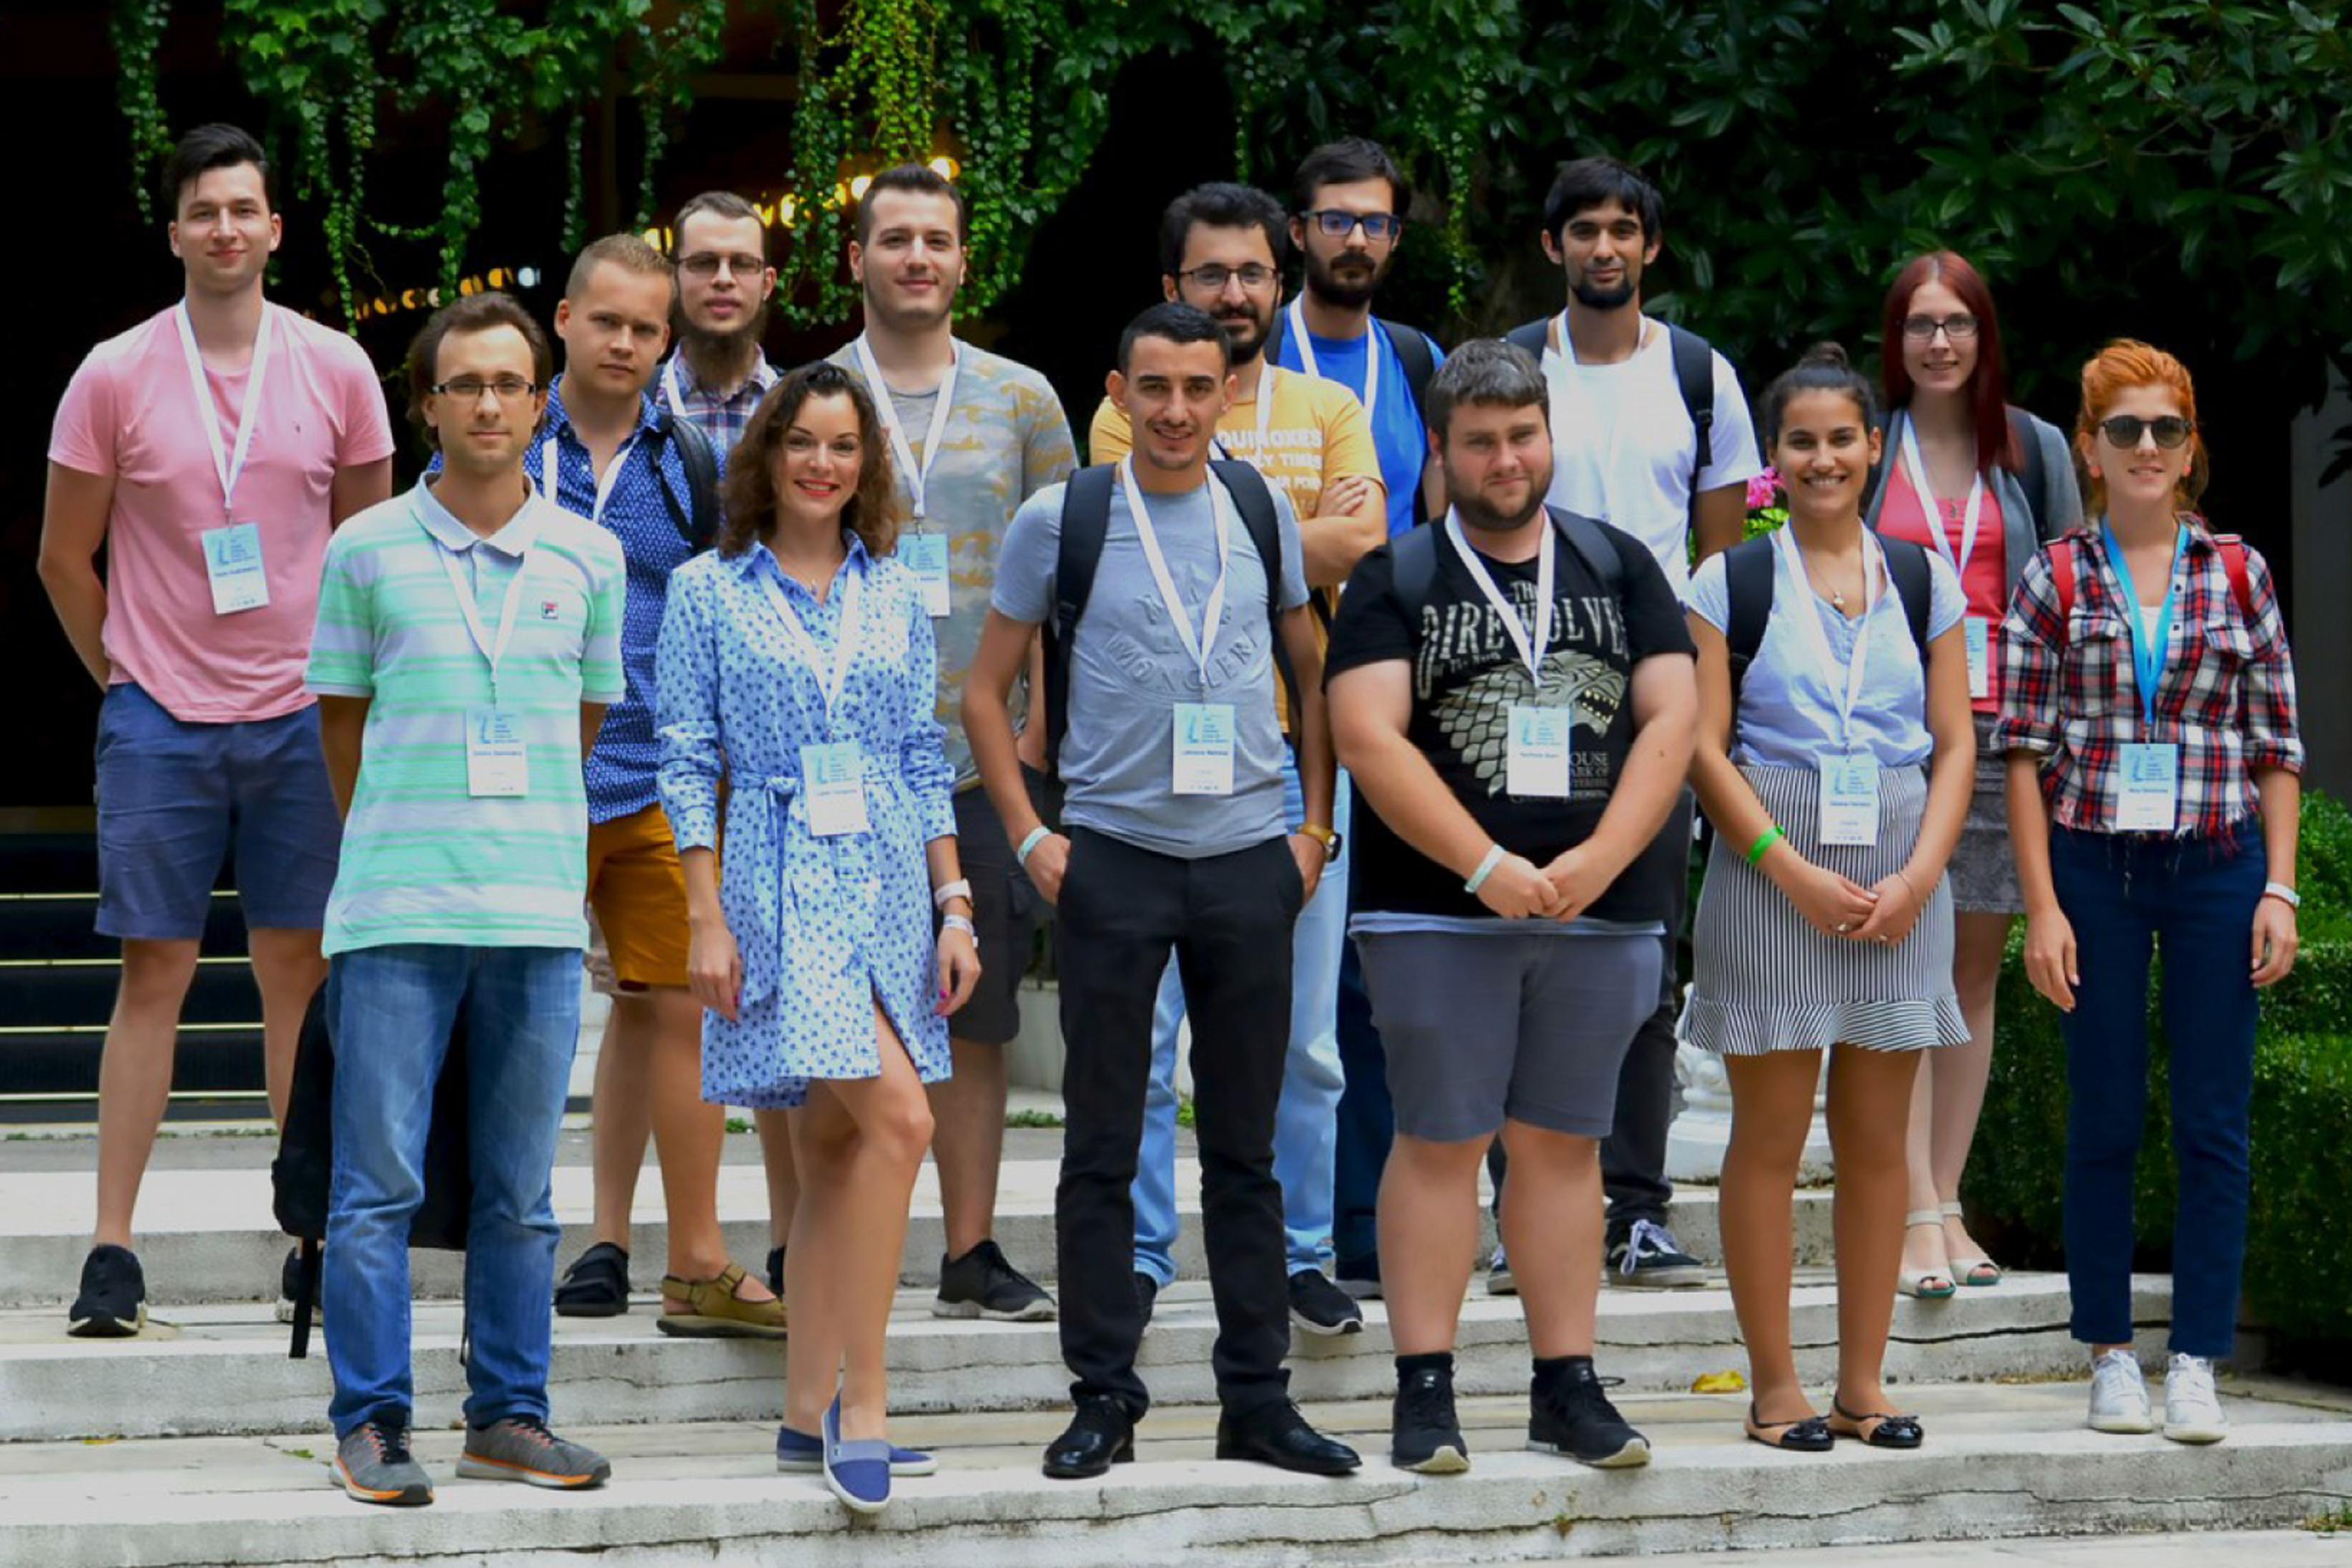 [ESCGC2-participants-with-IUCr-grant]